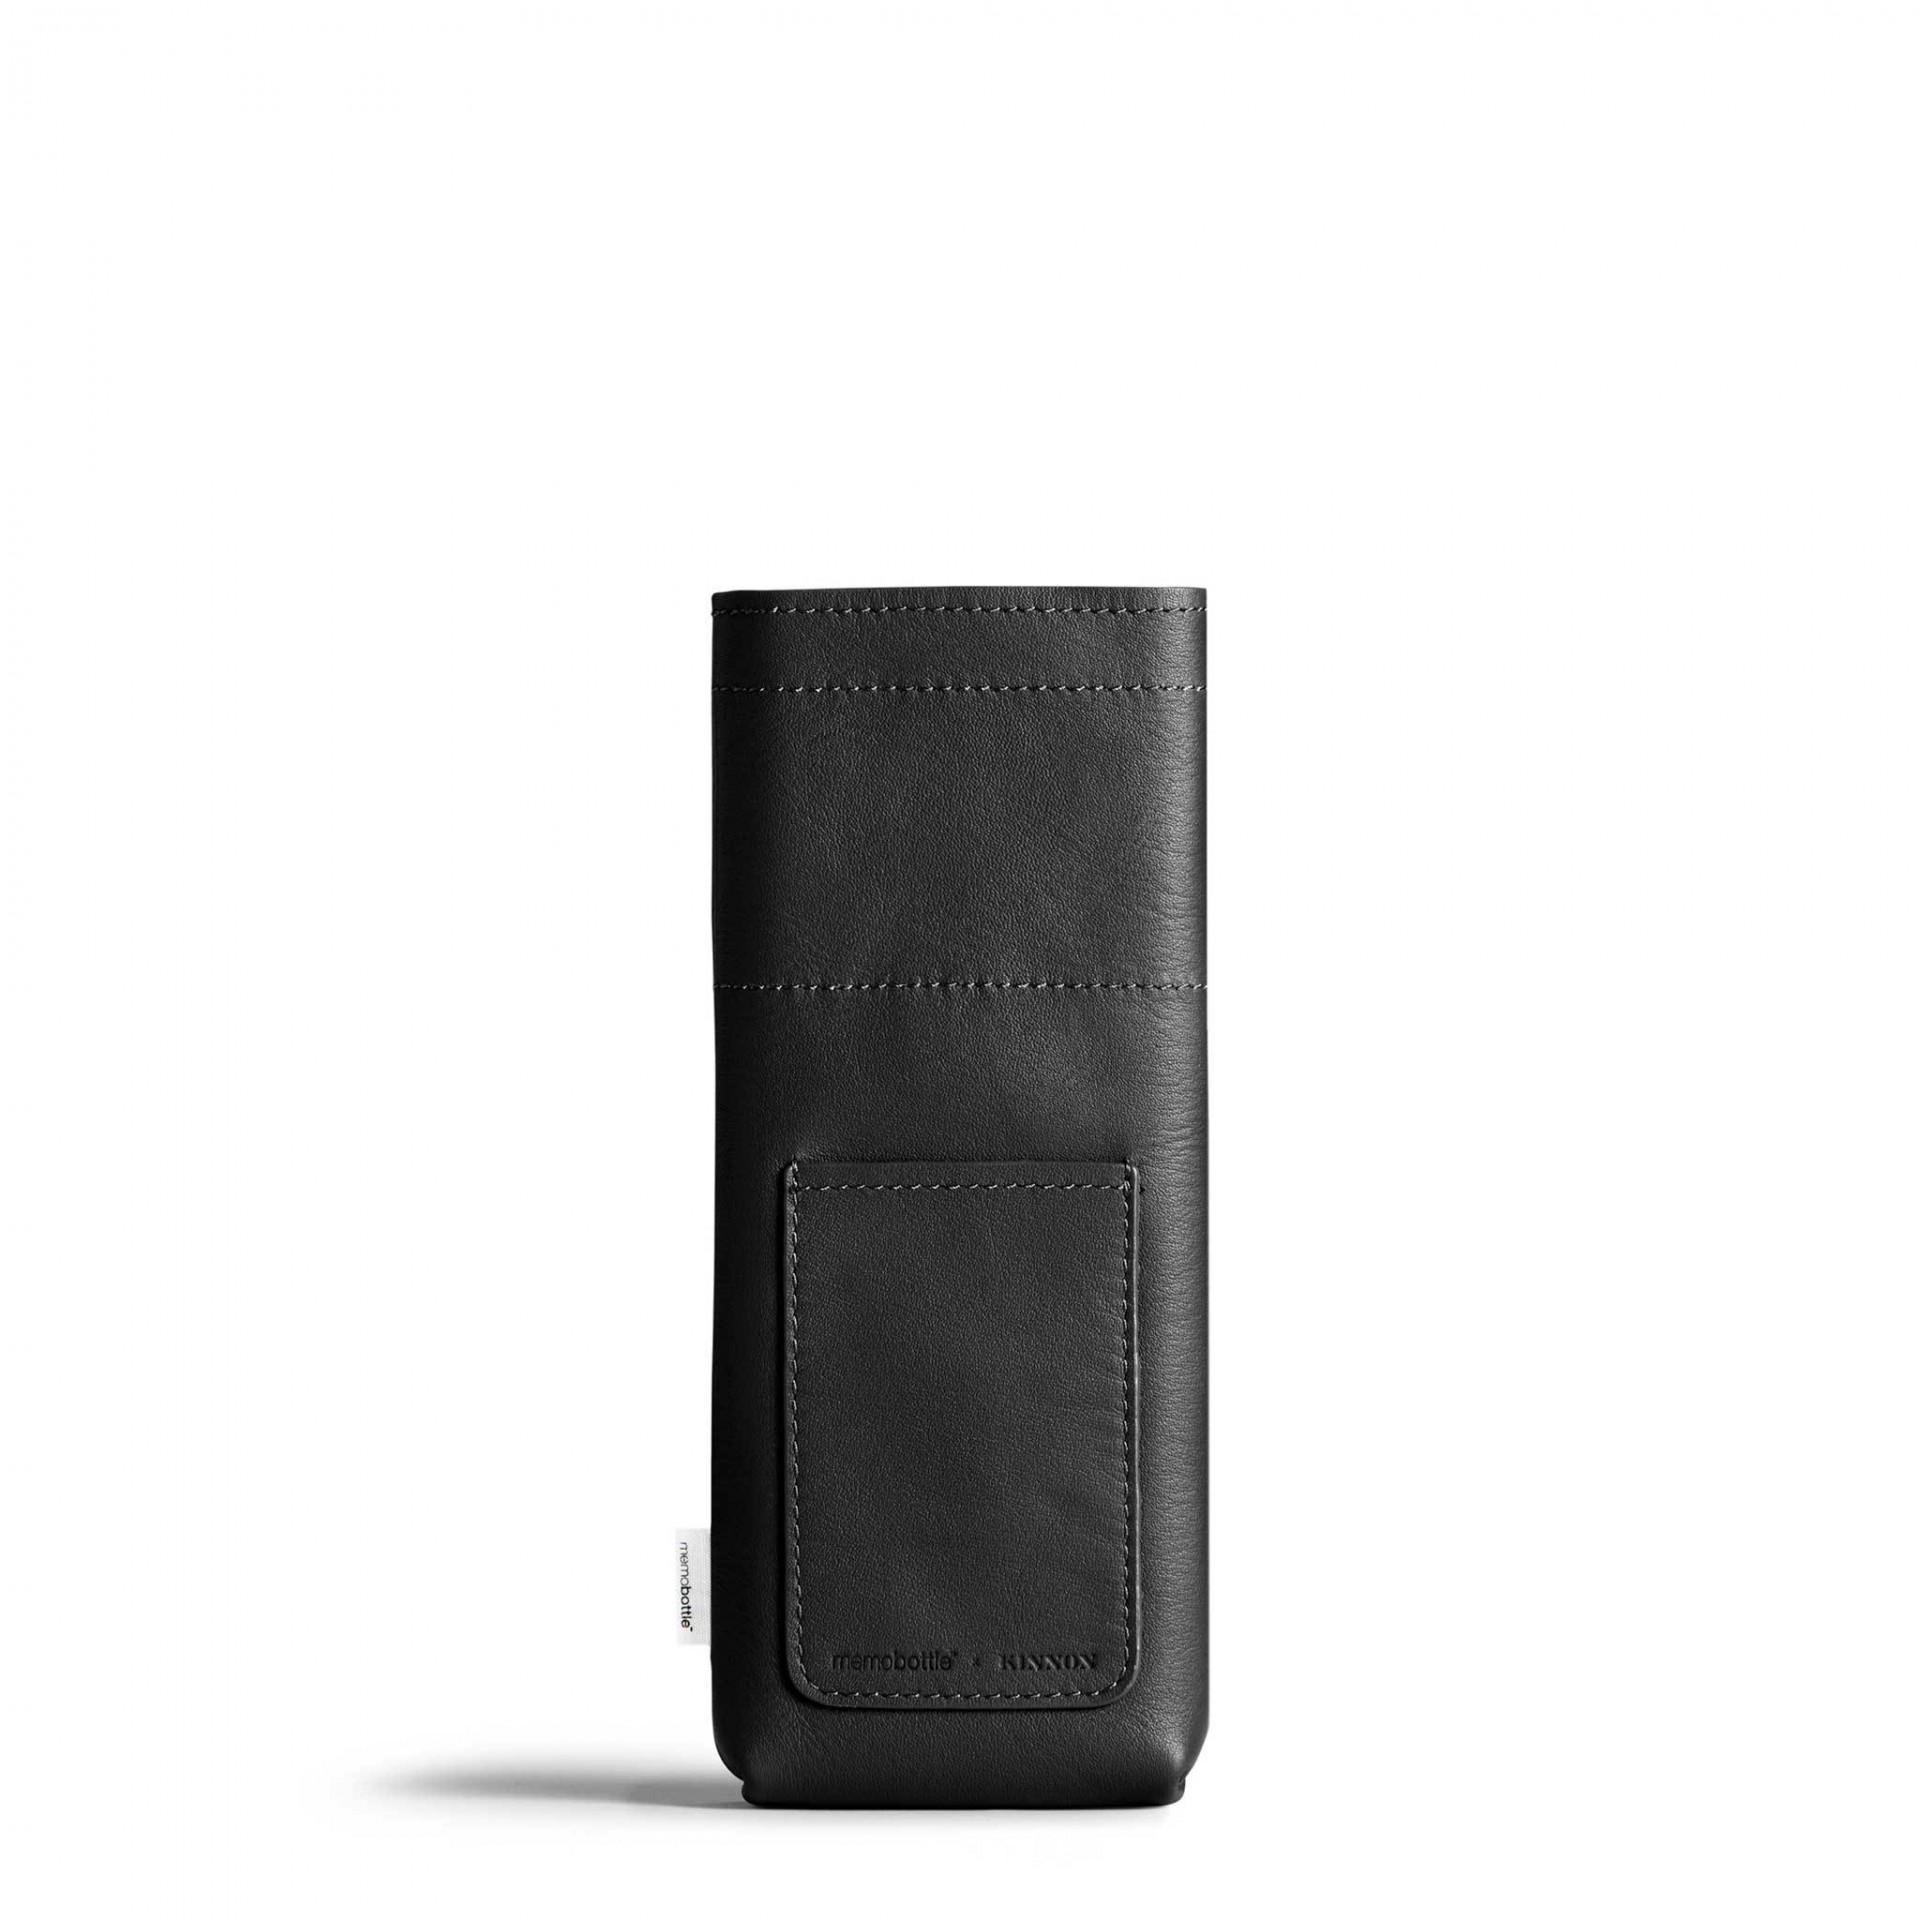 Slim Black Leather Sleeve memobottle